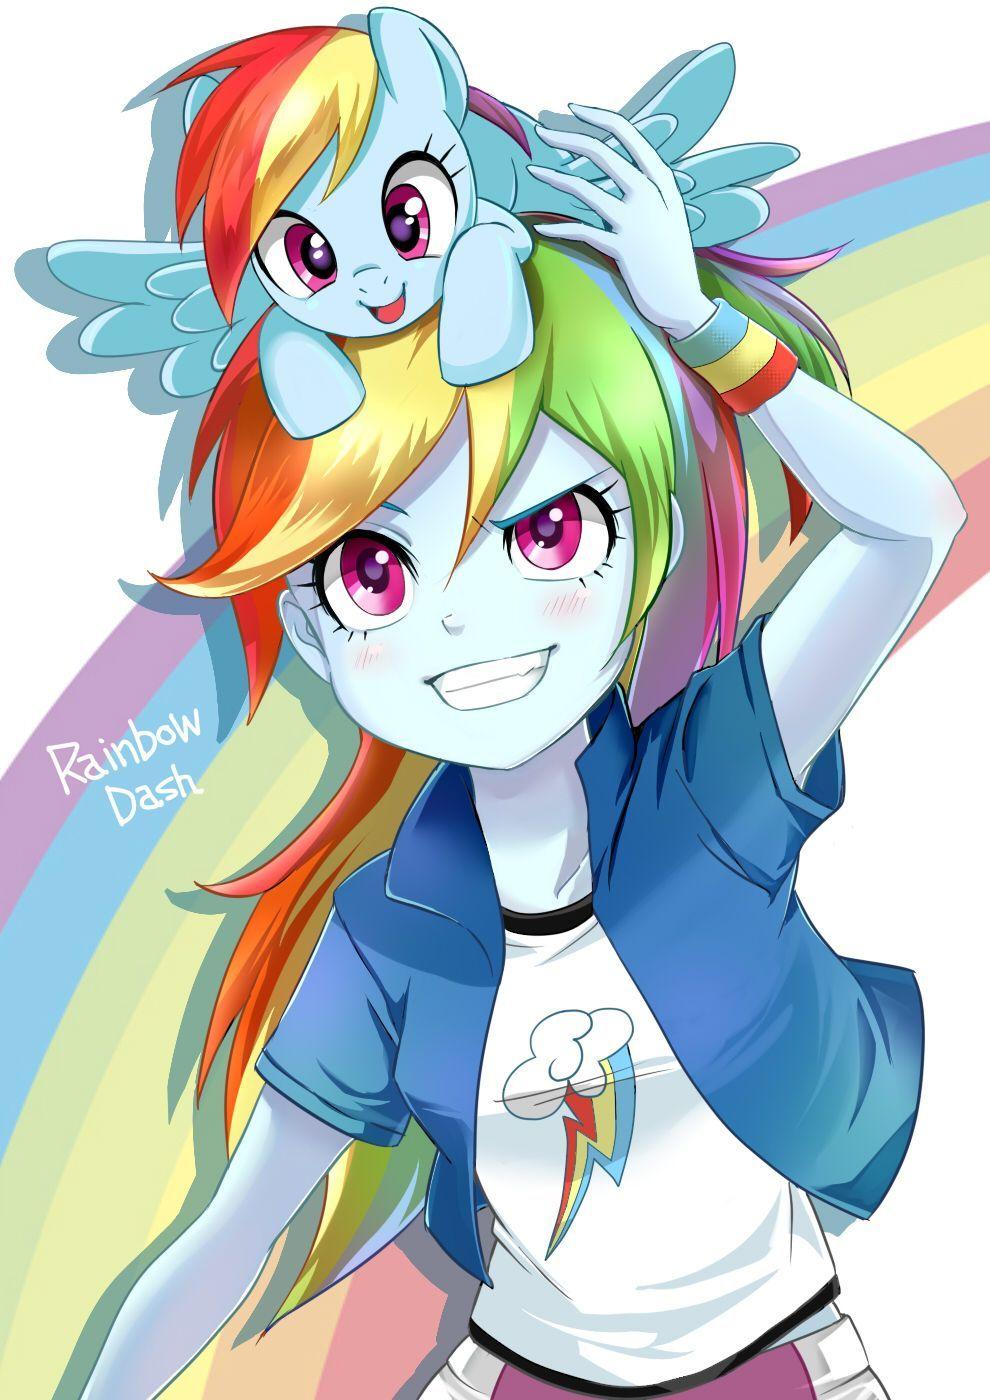 #1354970 - artist:aruba, blushing, cute, equestria girls, grin, pixiv, pony hat,... -  #1354970 – artist:aruba, blushing, cute, equestria girls, grin, pixiv, pony hat, rainbow, rainbow - #artistaruba #blushing #cartoonnetwork #cute #Equestria #Girls #grin #hat #miraculous #miraculousladybug #miraculousladybugandcatnoir #miraculousladybugseason4 #miraculousladybugseason4episode1 #mylittlepony #mylittleponyequestriagirls #pixiv #Pony